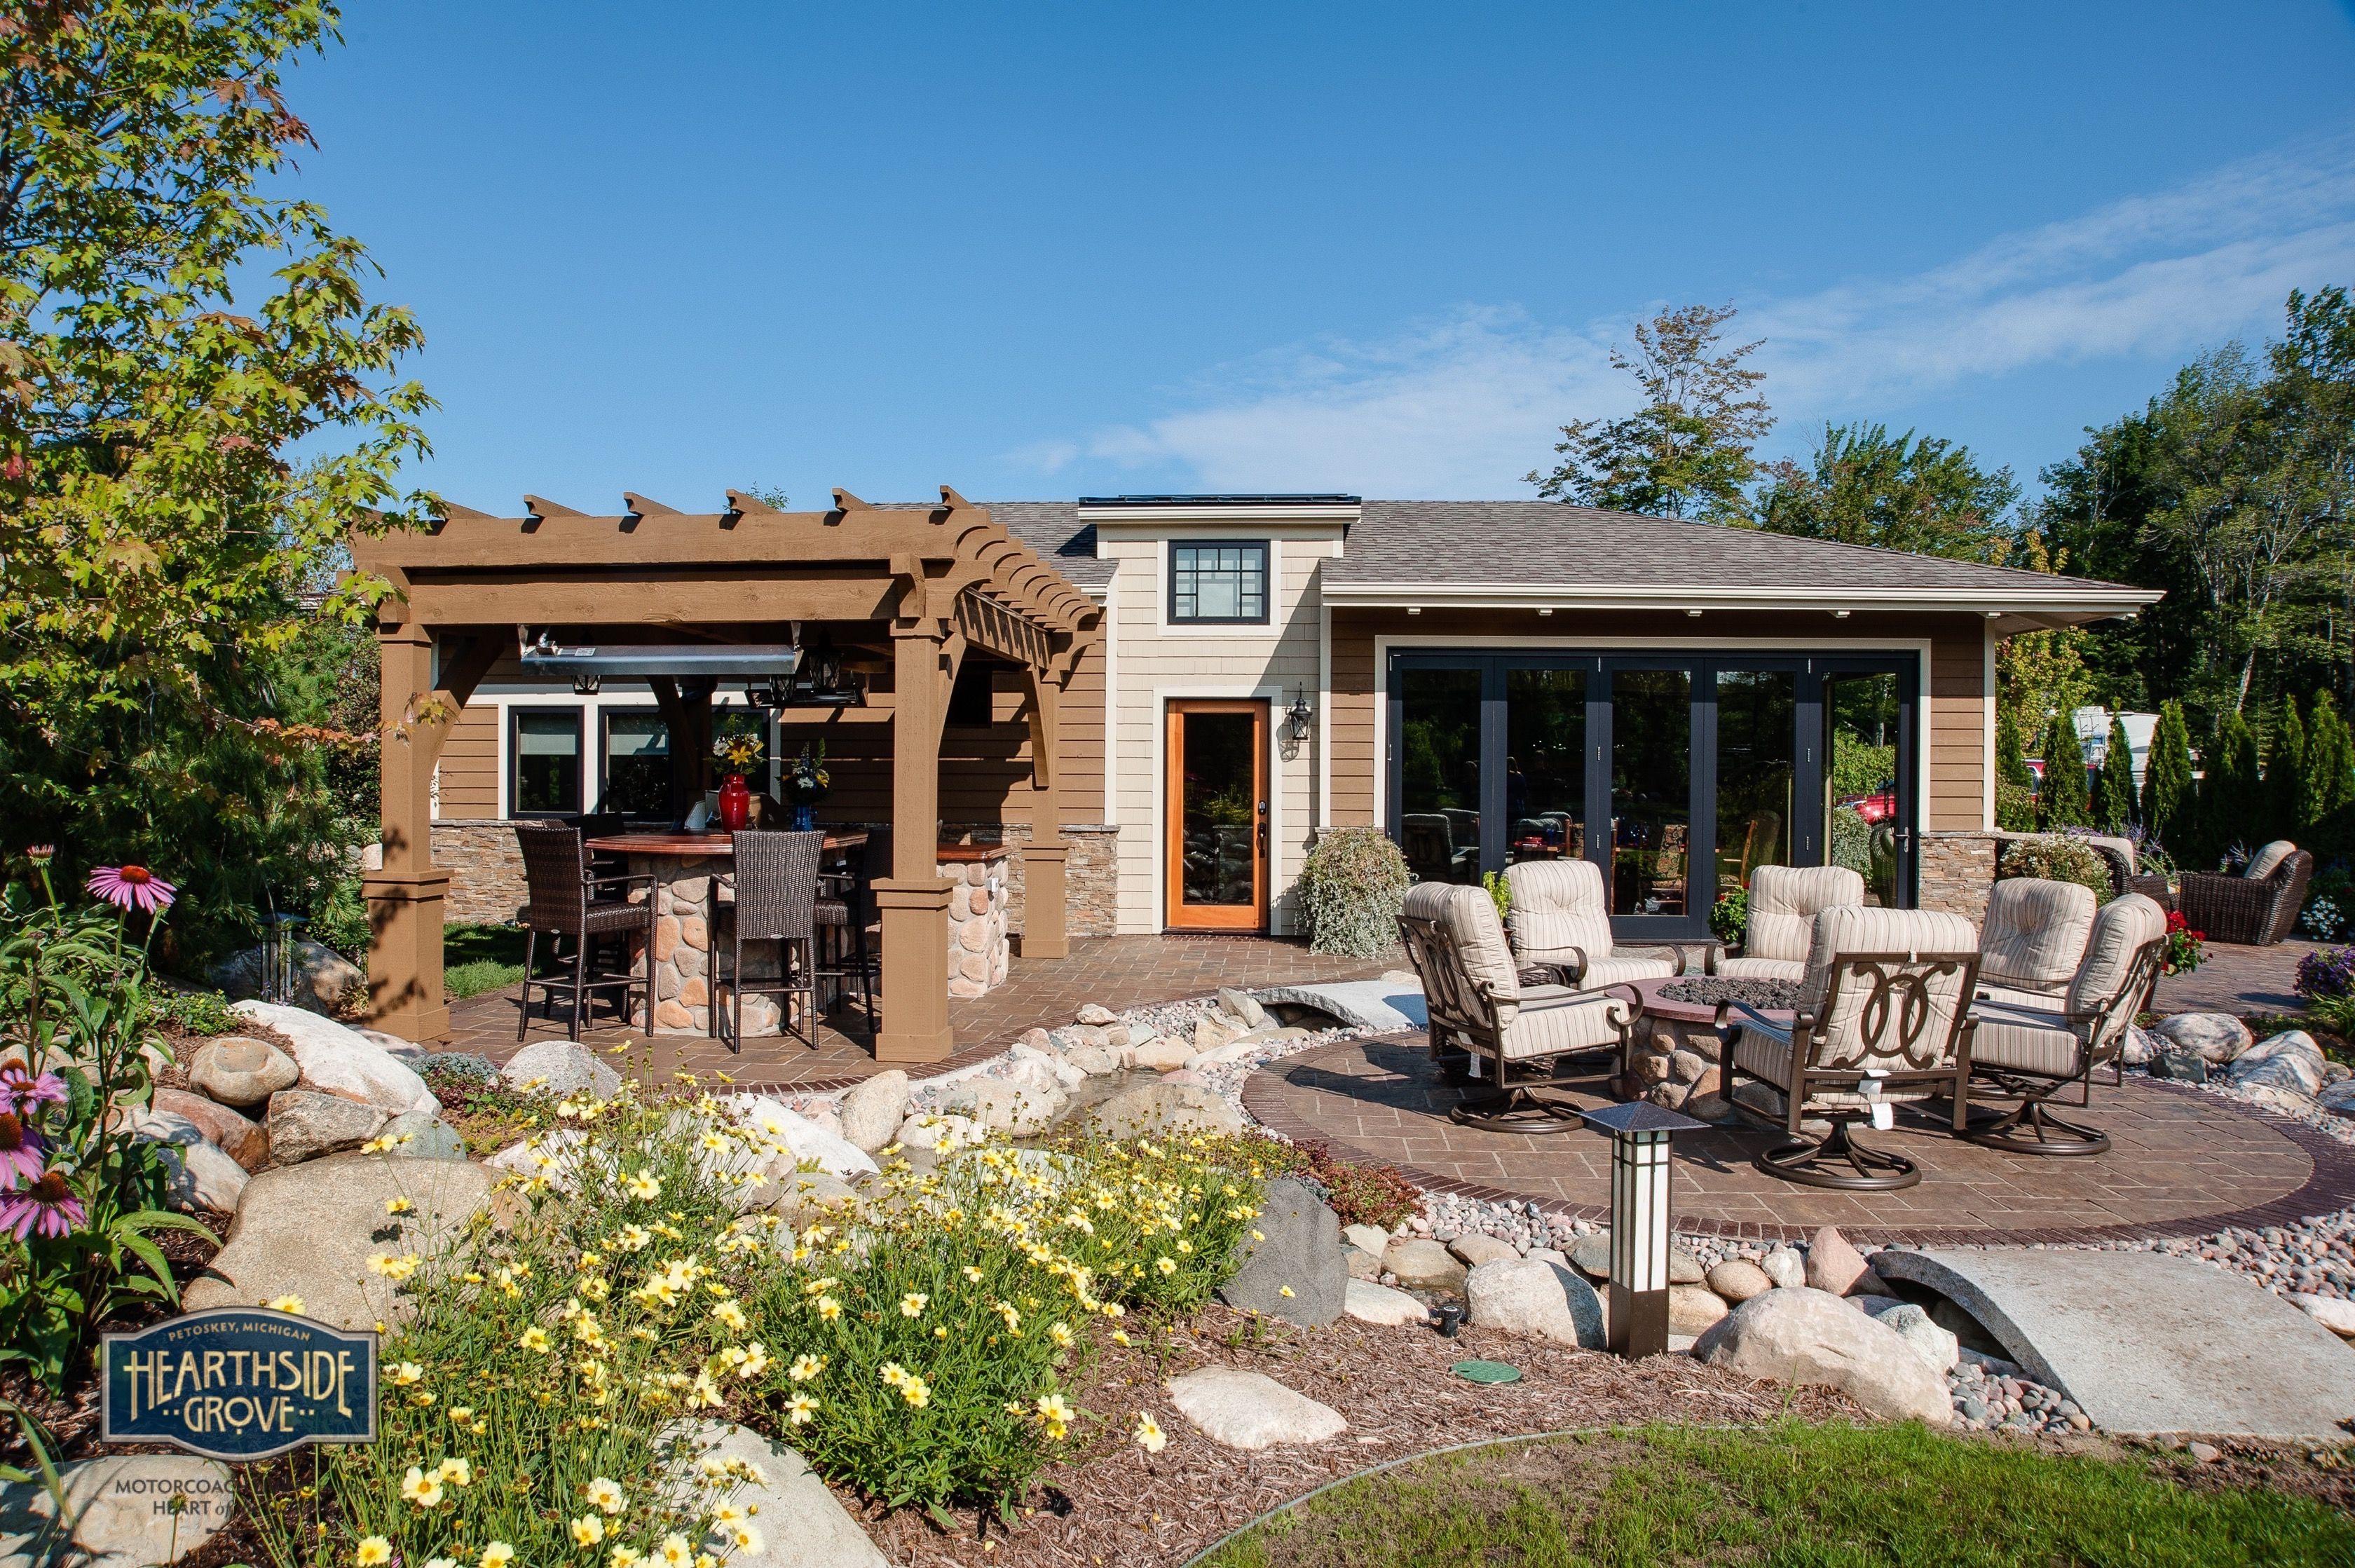 Hearthside Grove Luxury Motorhome Resort Lot 157   #exterior #pergola  #bungalow #patio